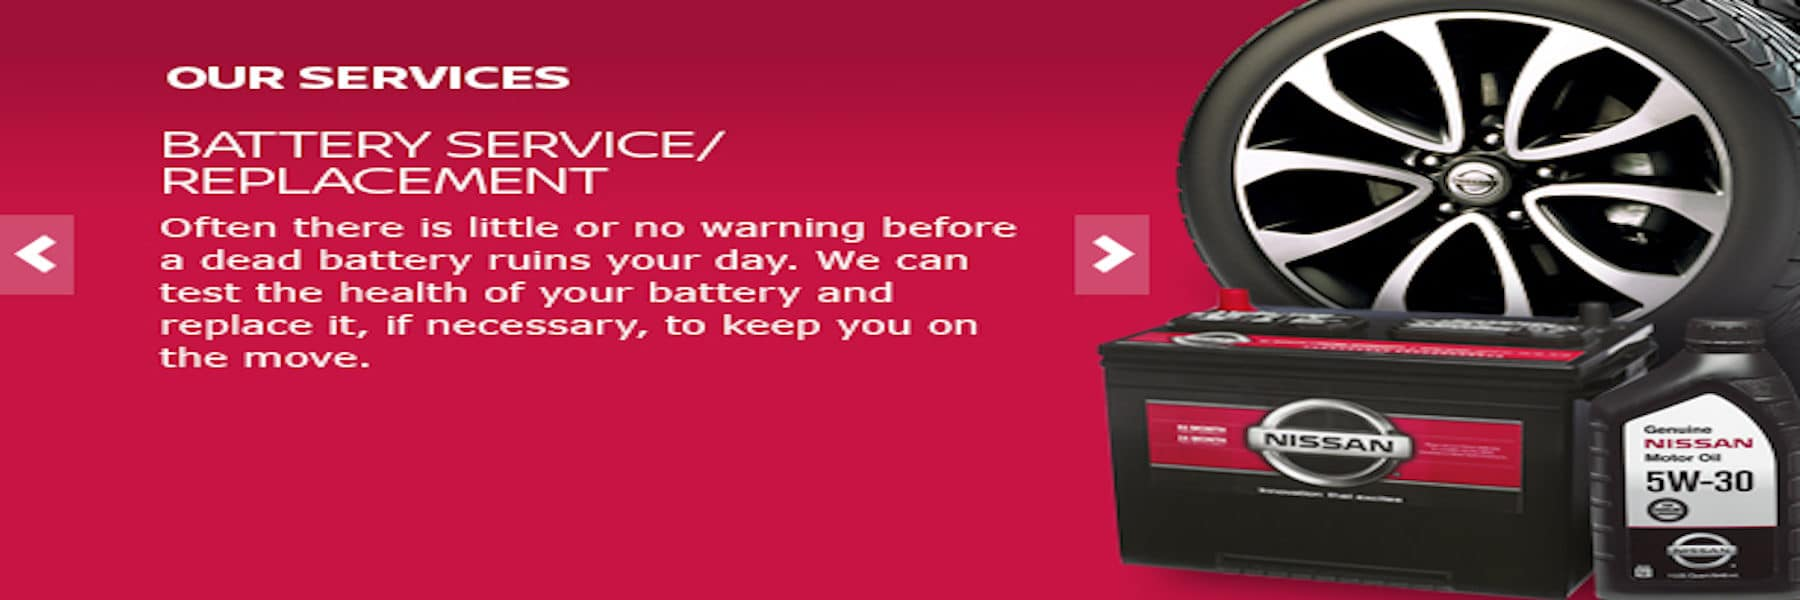 Battery Services copy